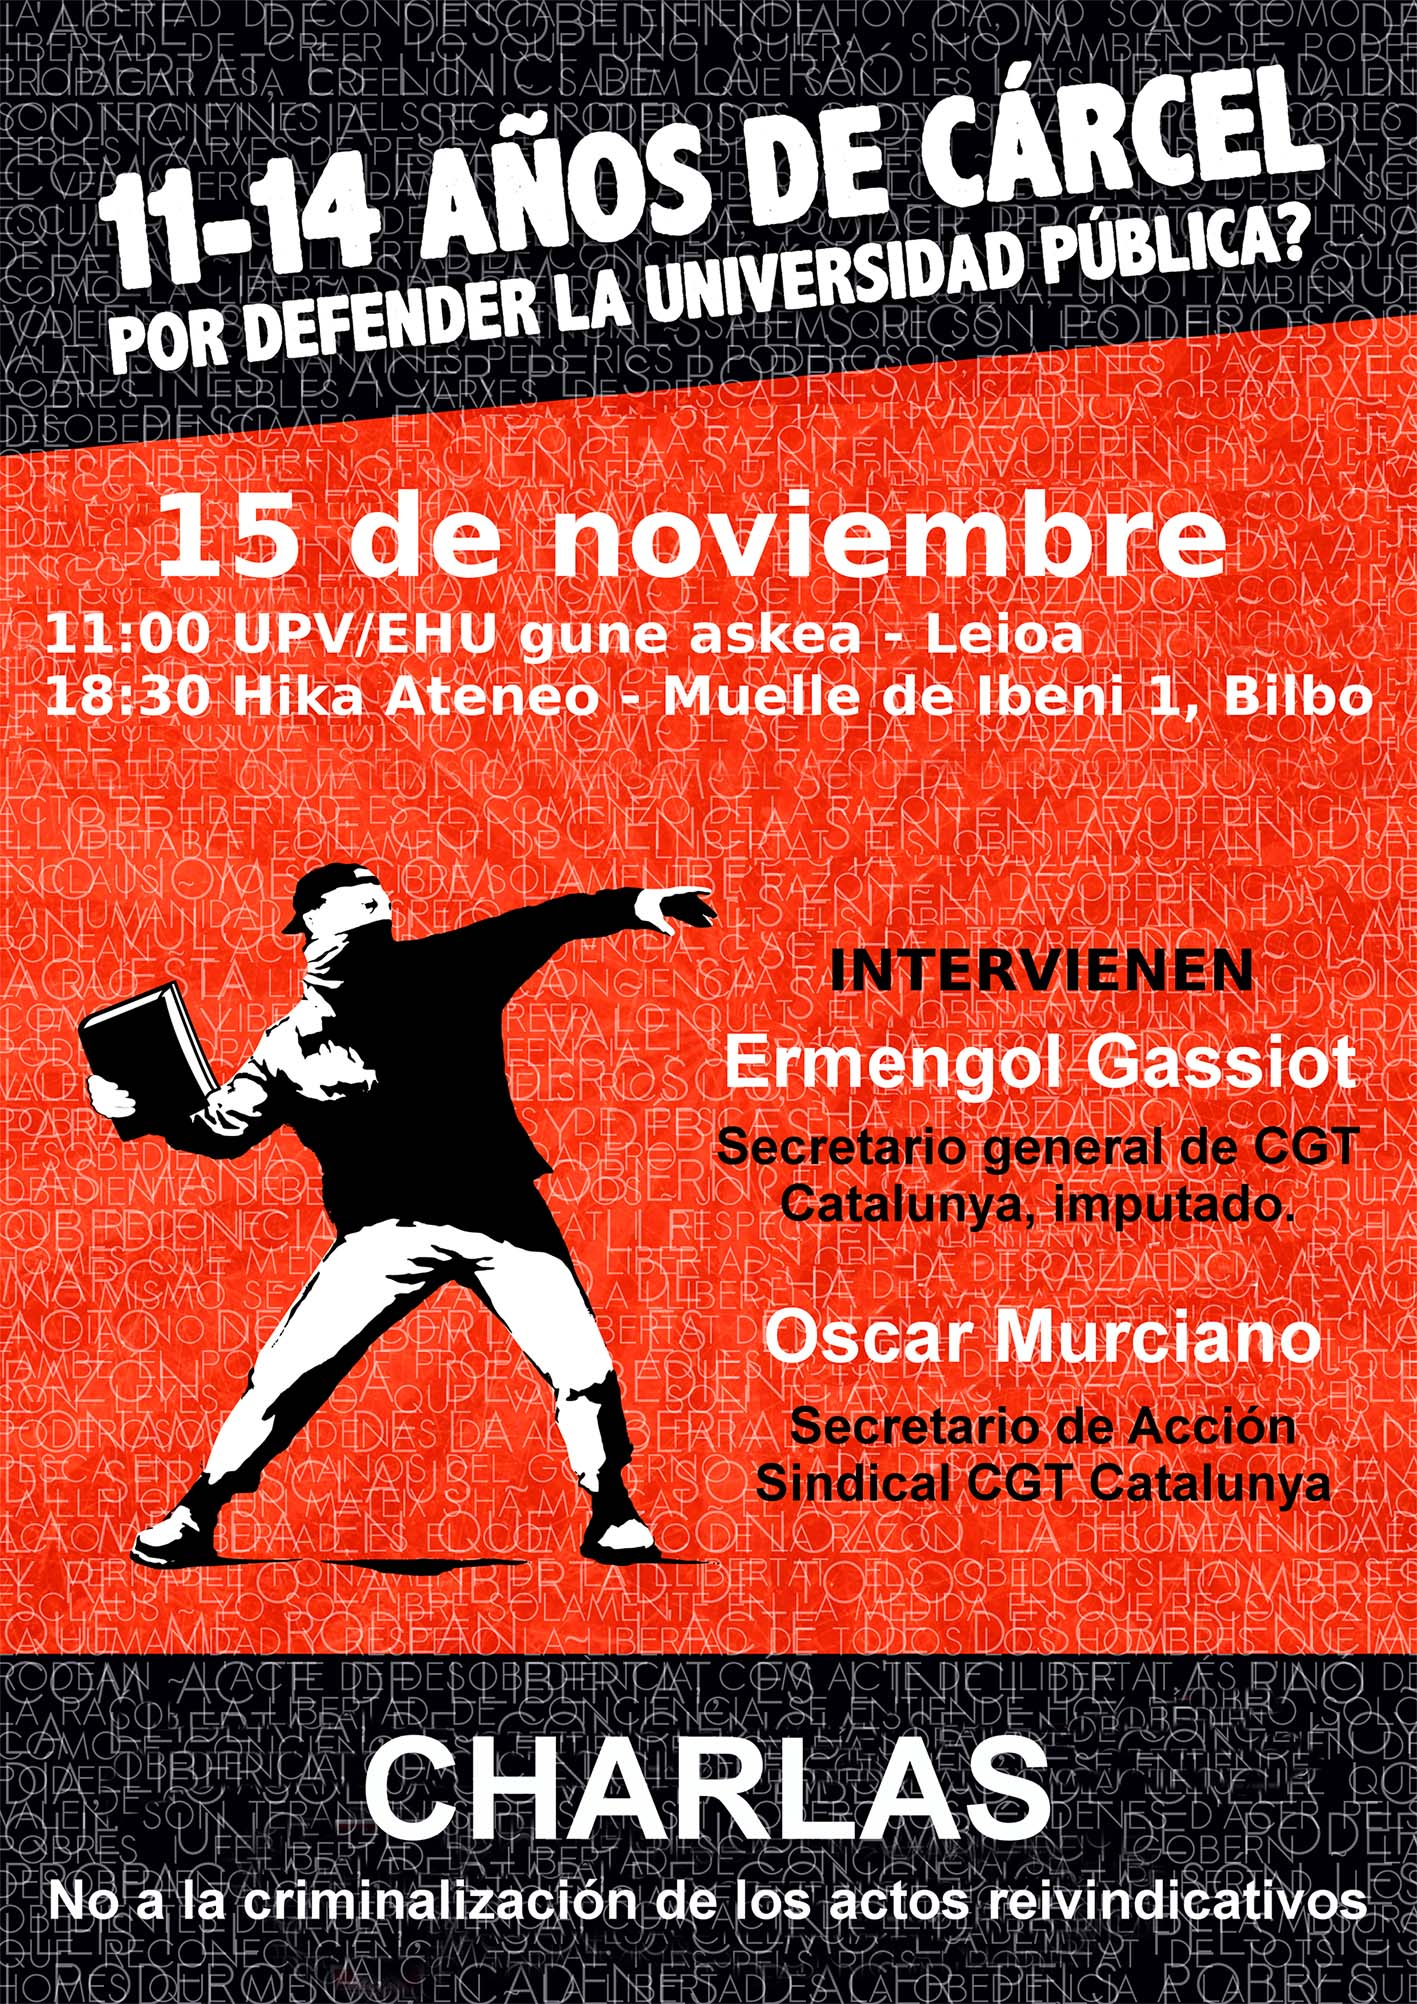 CGT 15-11-2016 castellano hikaateneo Bilbao